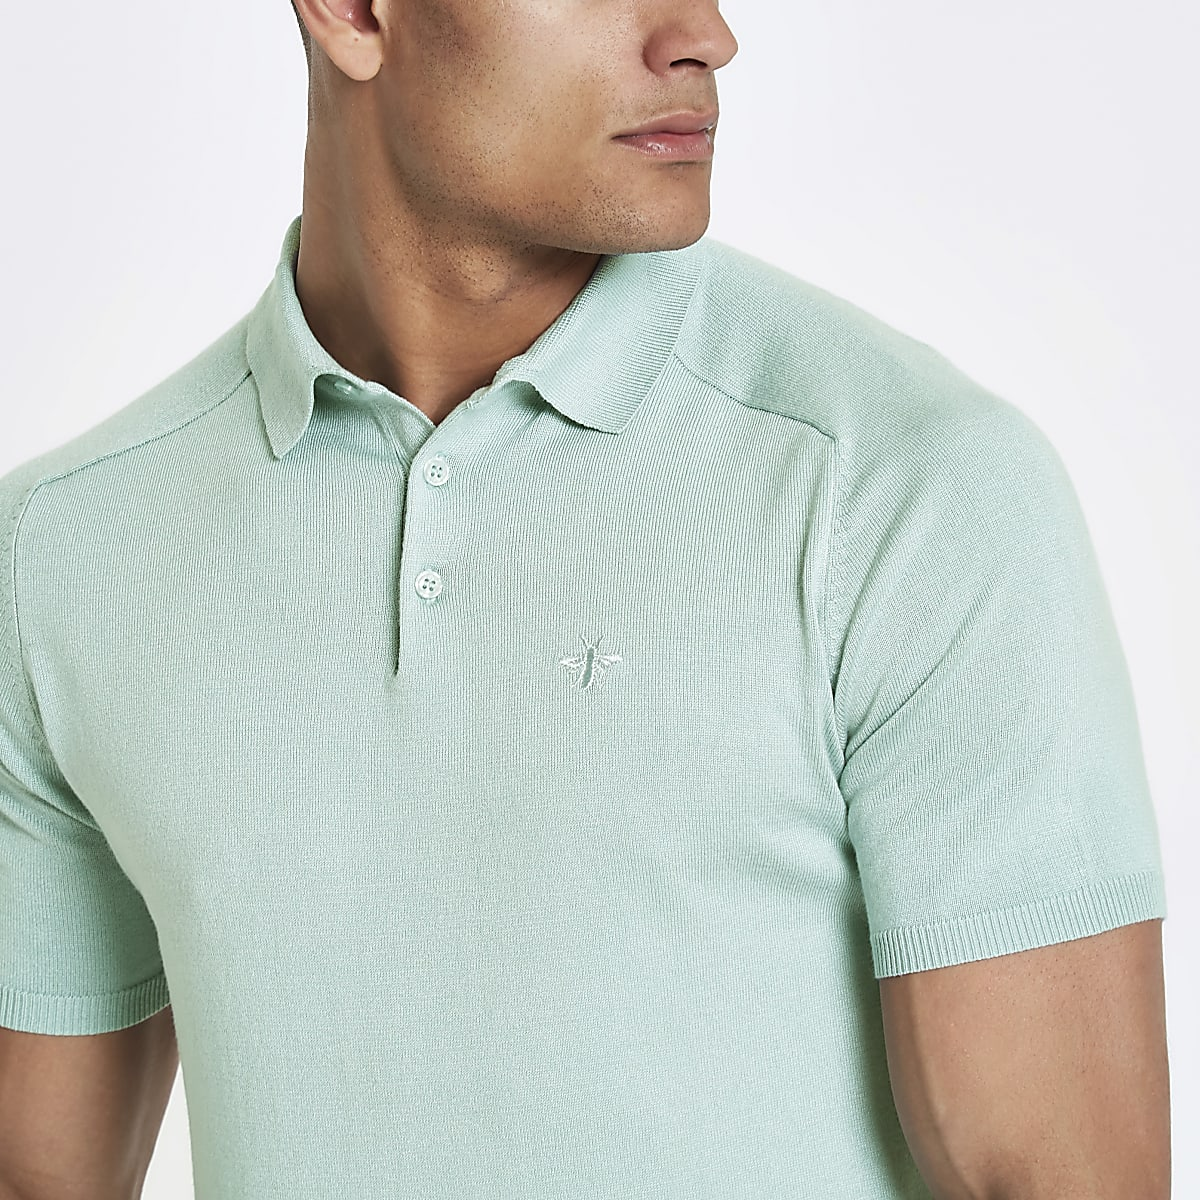 c5363db4 Mint green slim fit wasp knit polo shirt - Polo Shirts - men